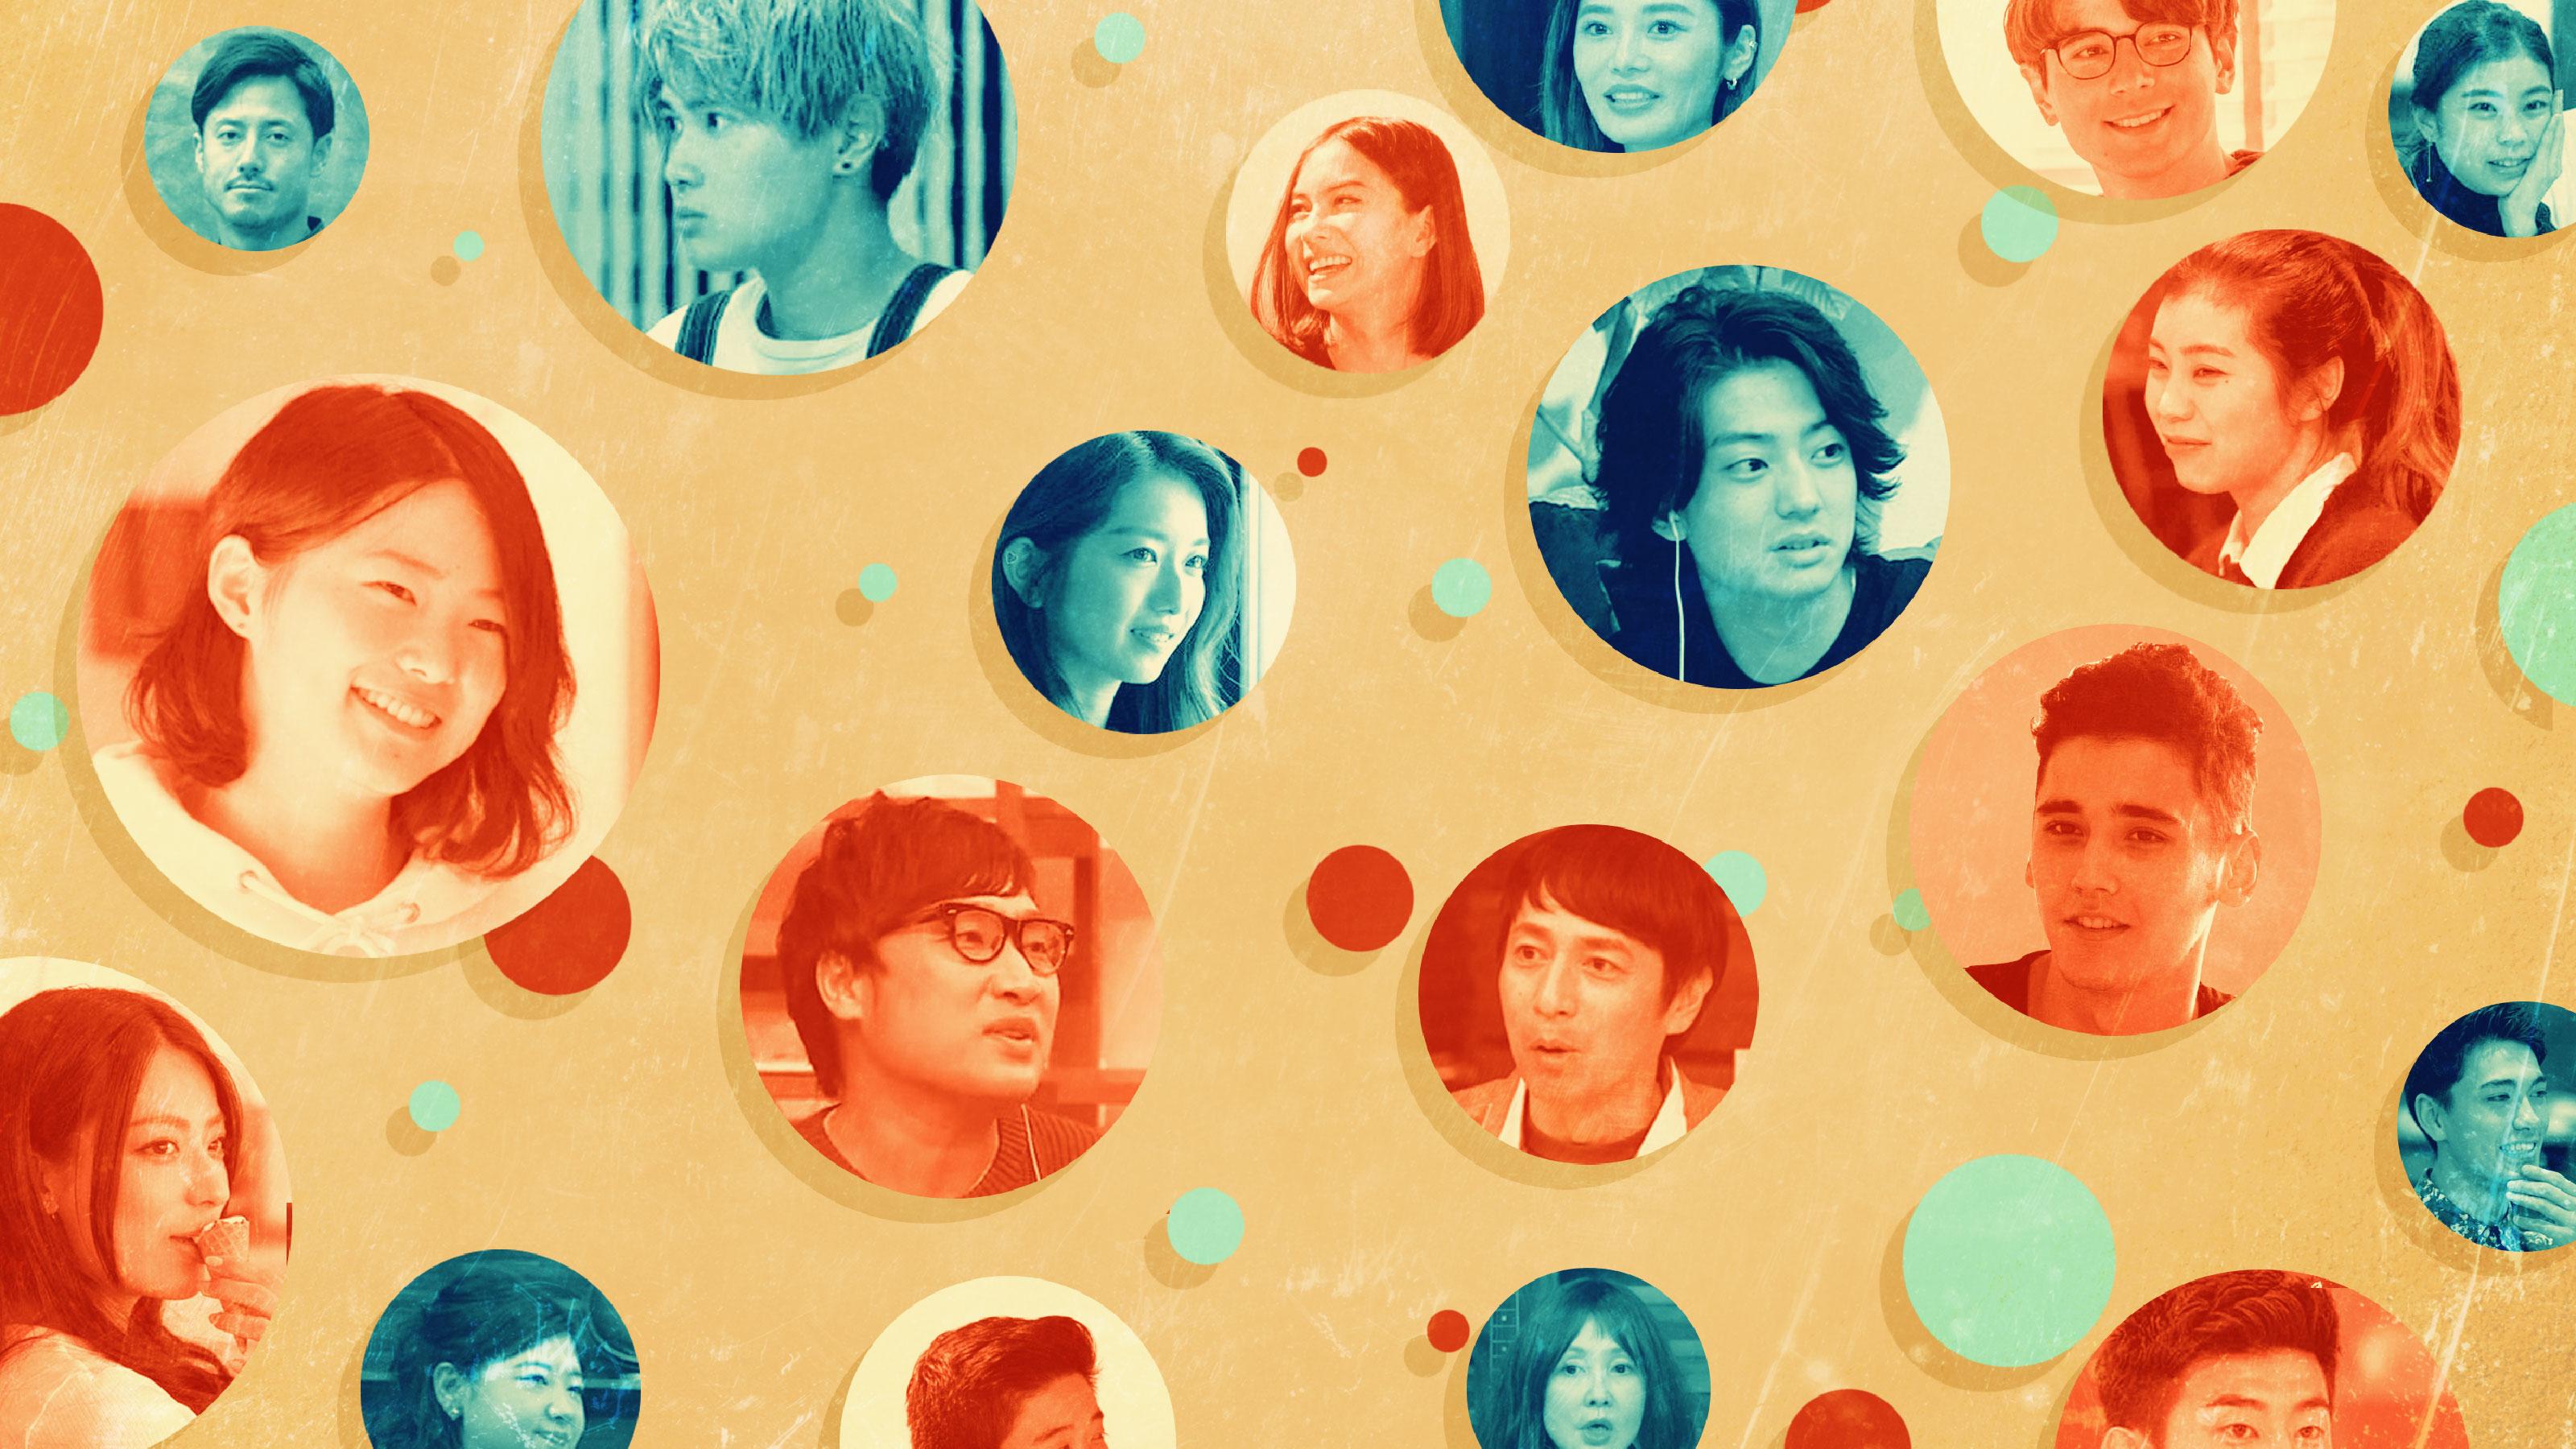 Terrace House' Is Netflix's Most Harrowing, Emotional